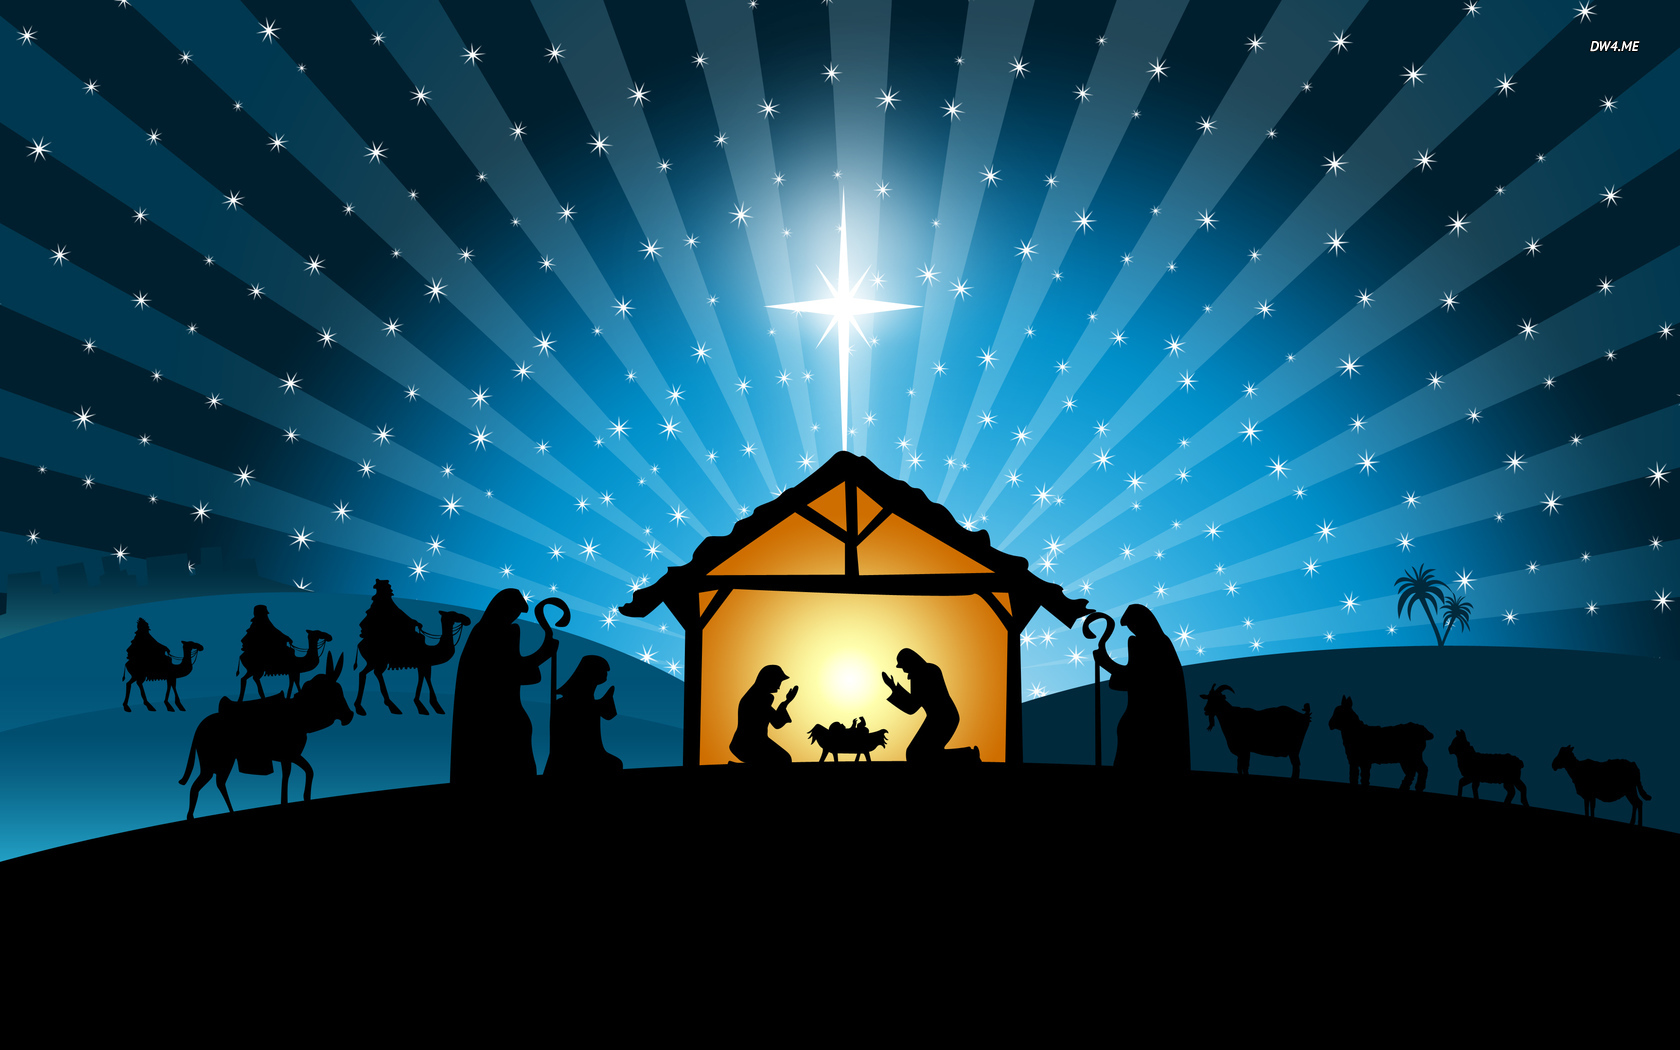 Nativity scene wallpaper   Holiday wallpapers   3554 1680x1050